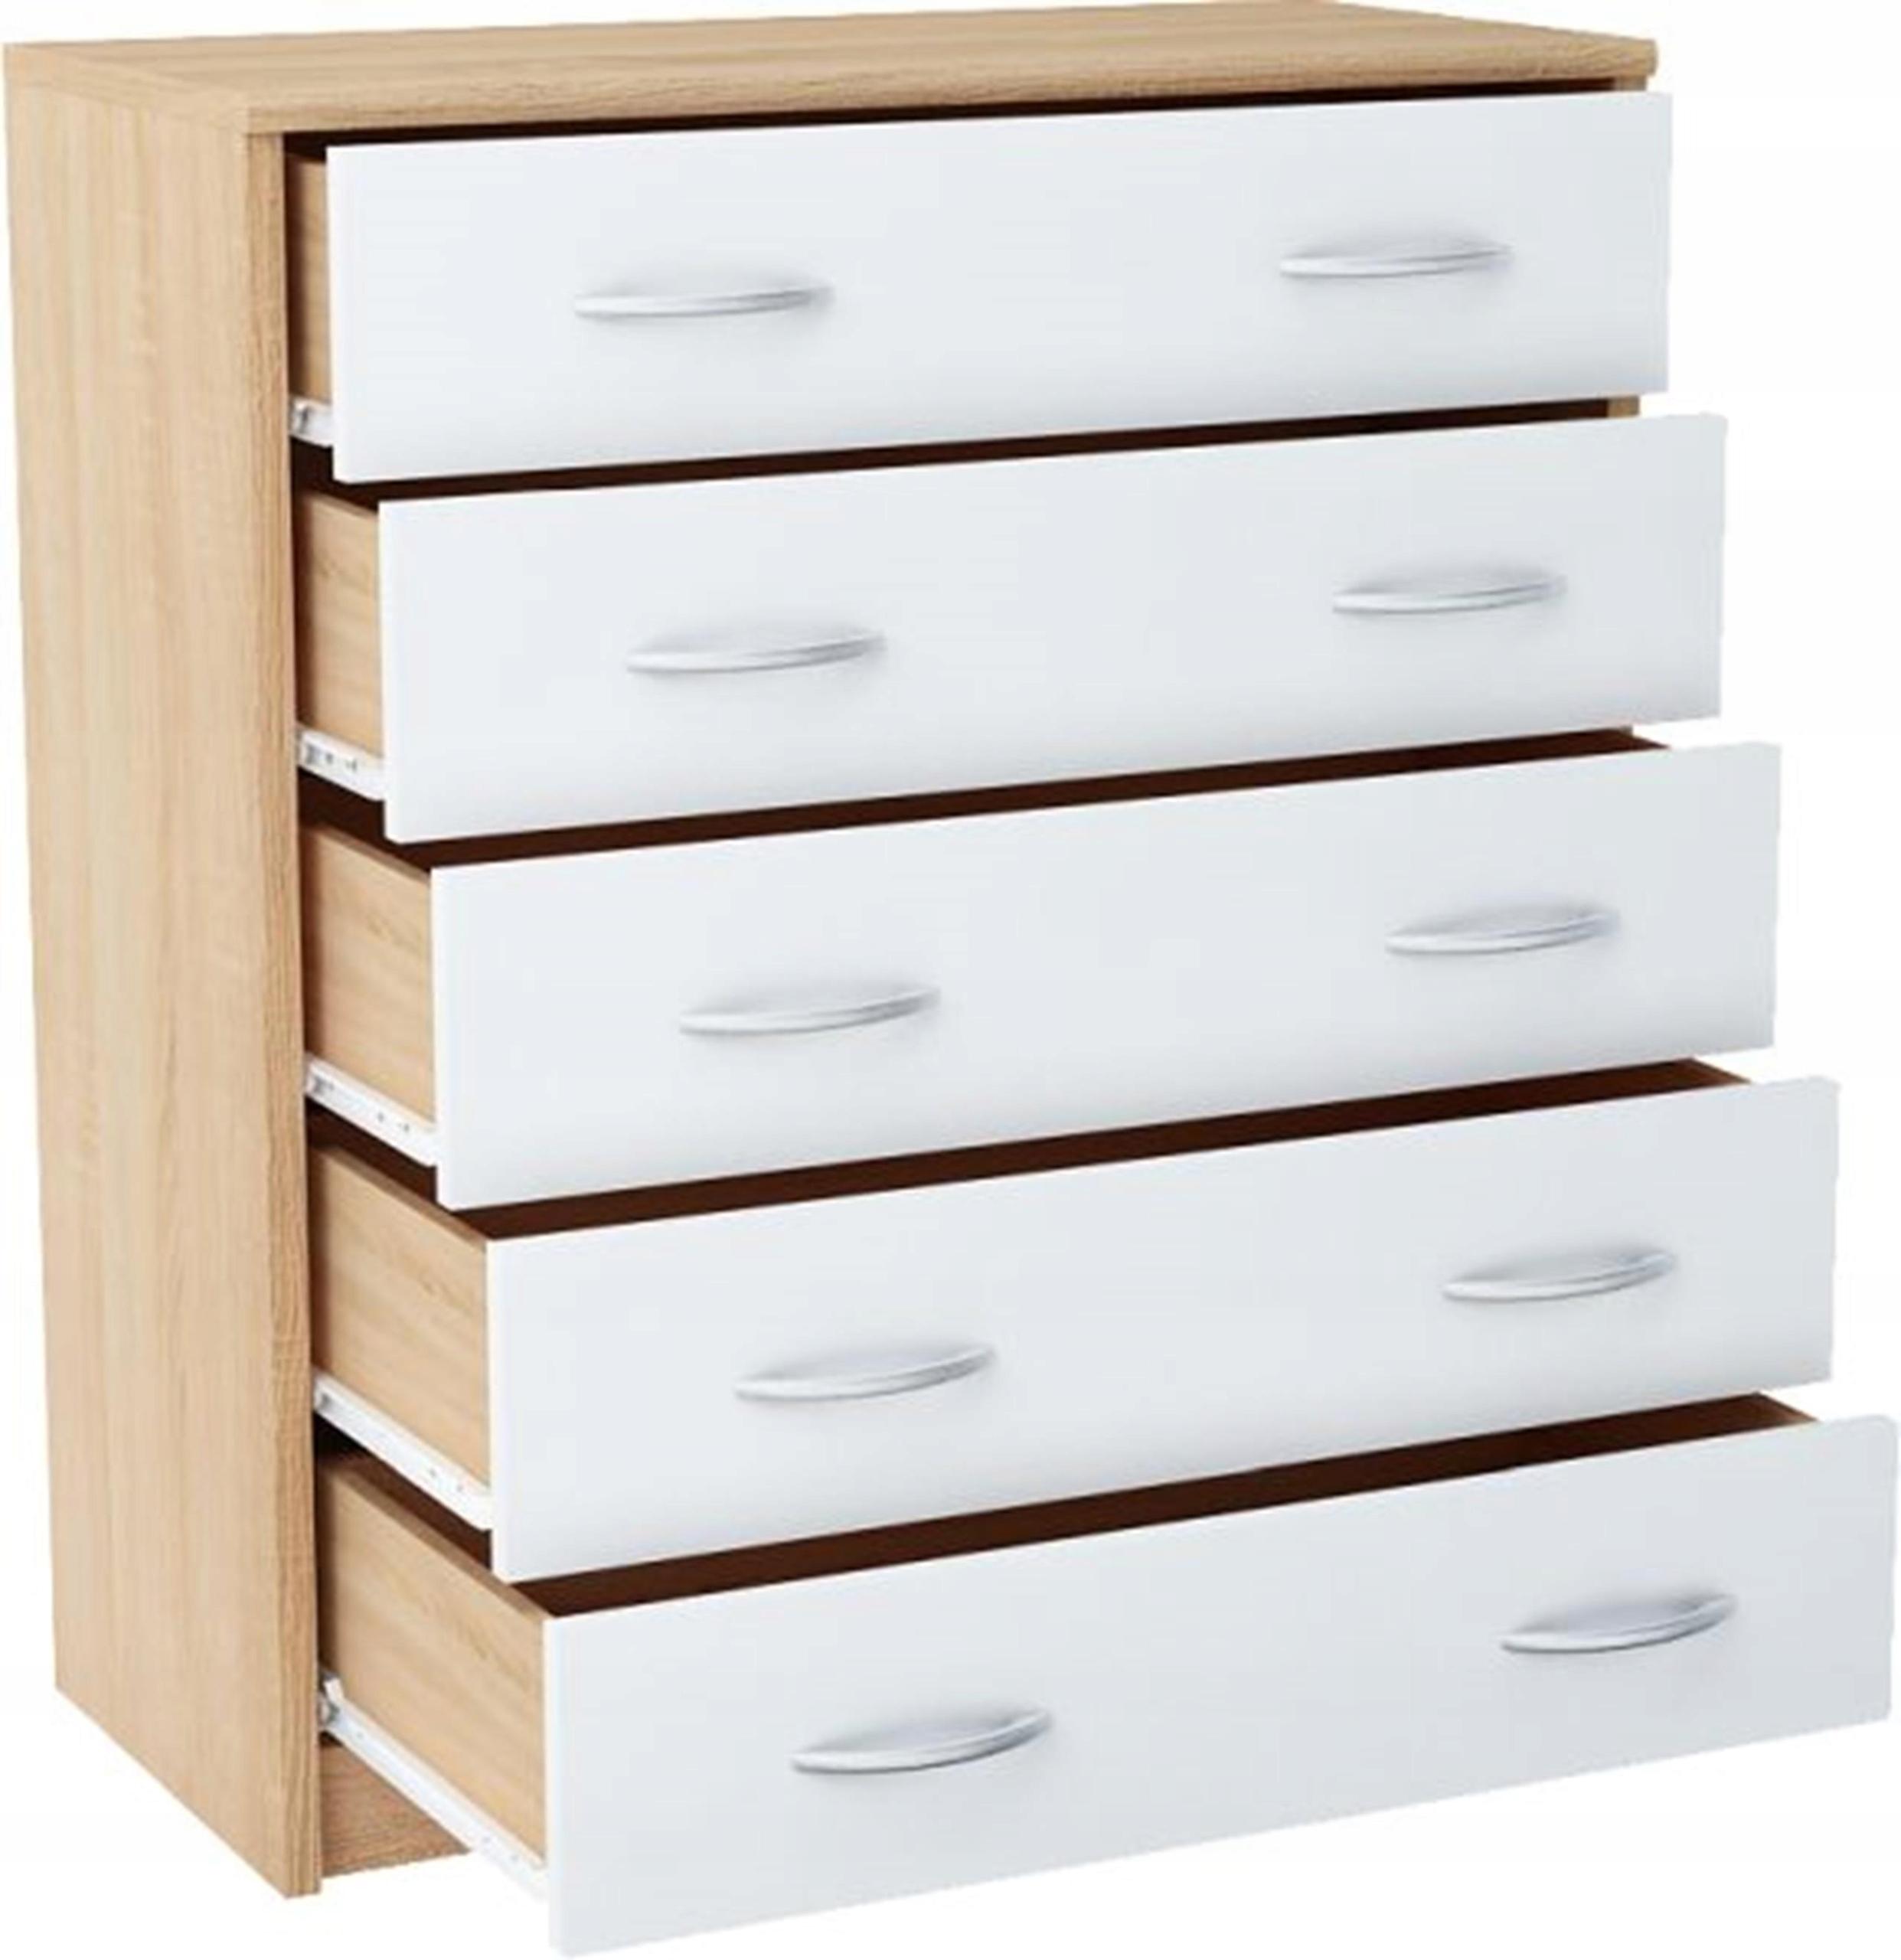 Комод 5S WHITE-SONOMA шкаф книжный с 5 ящиками